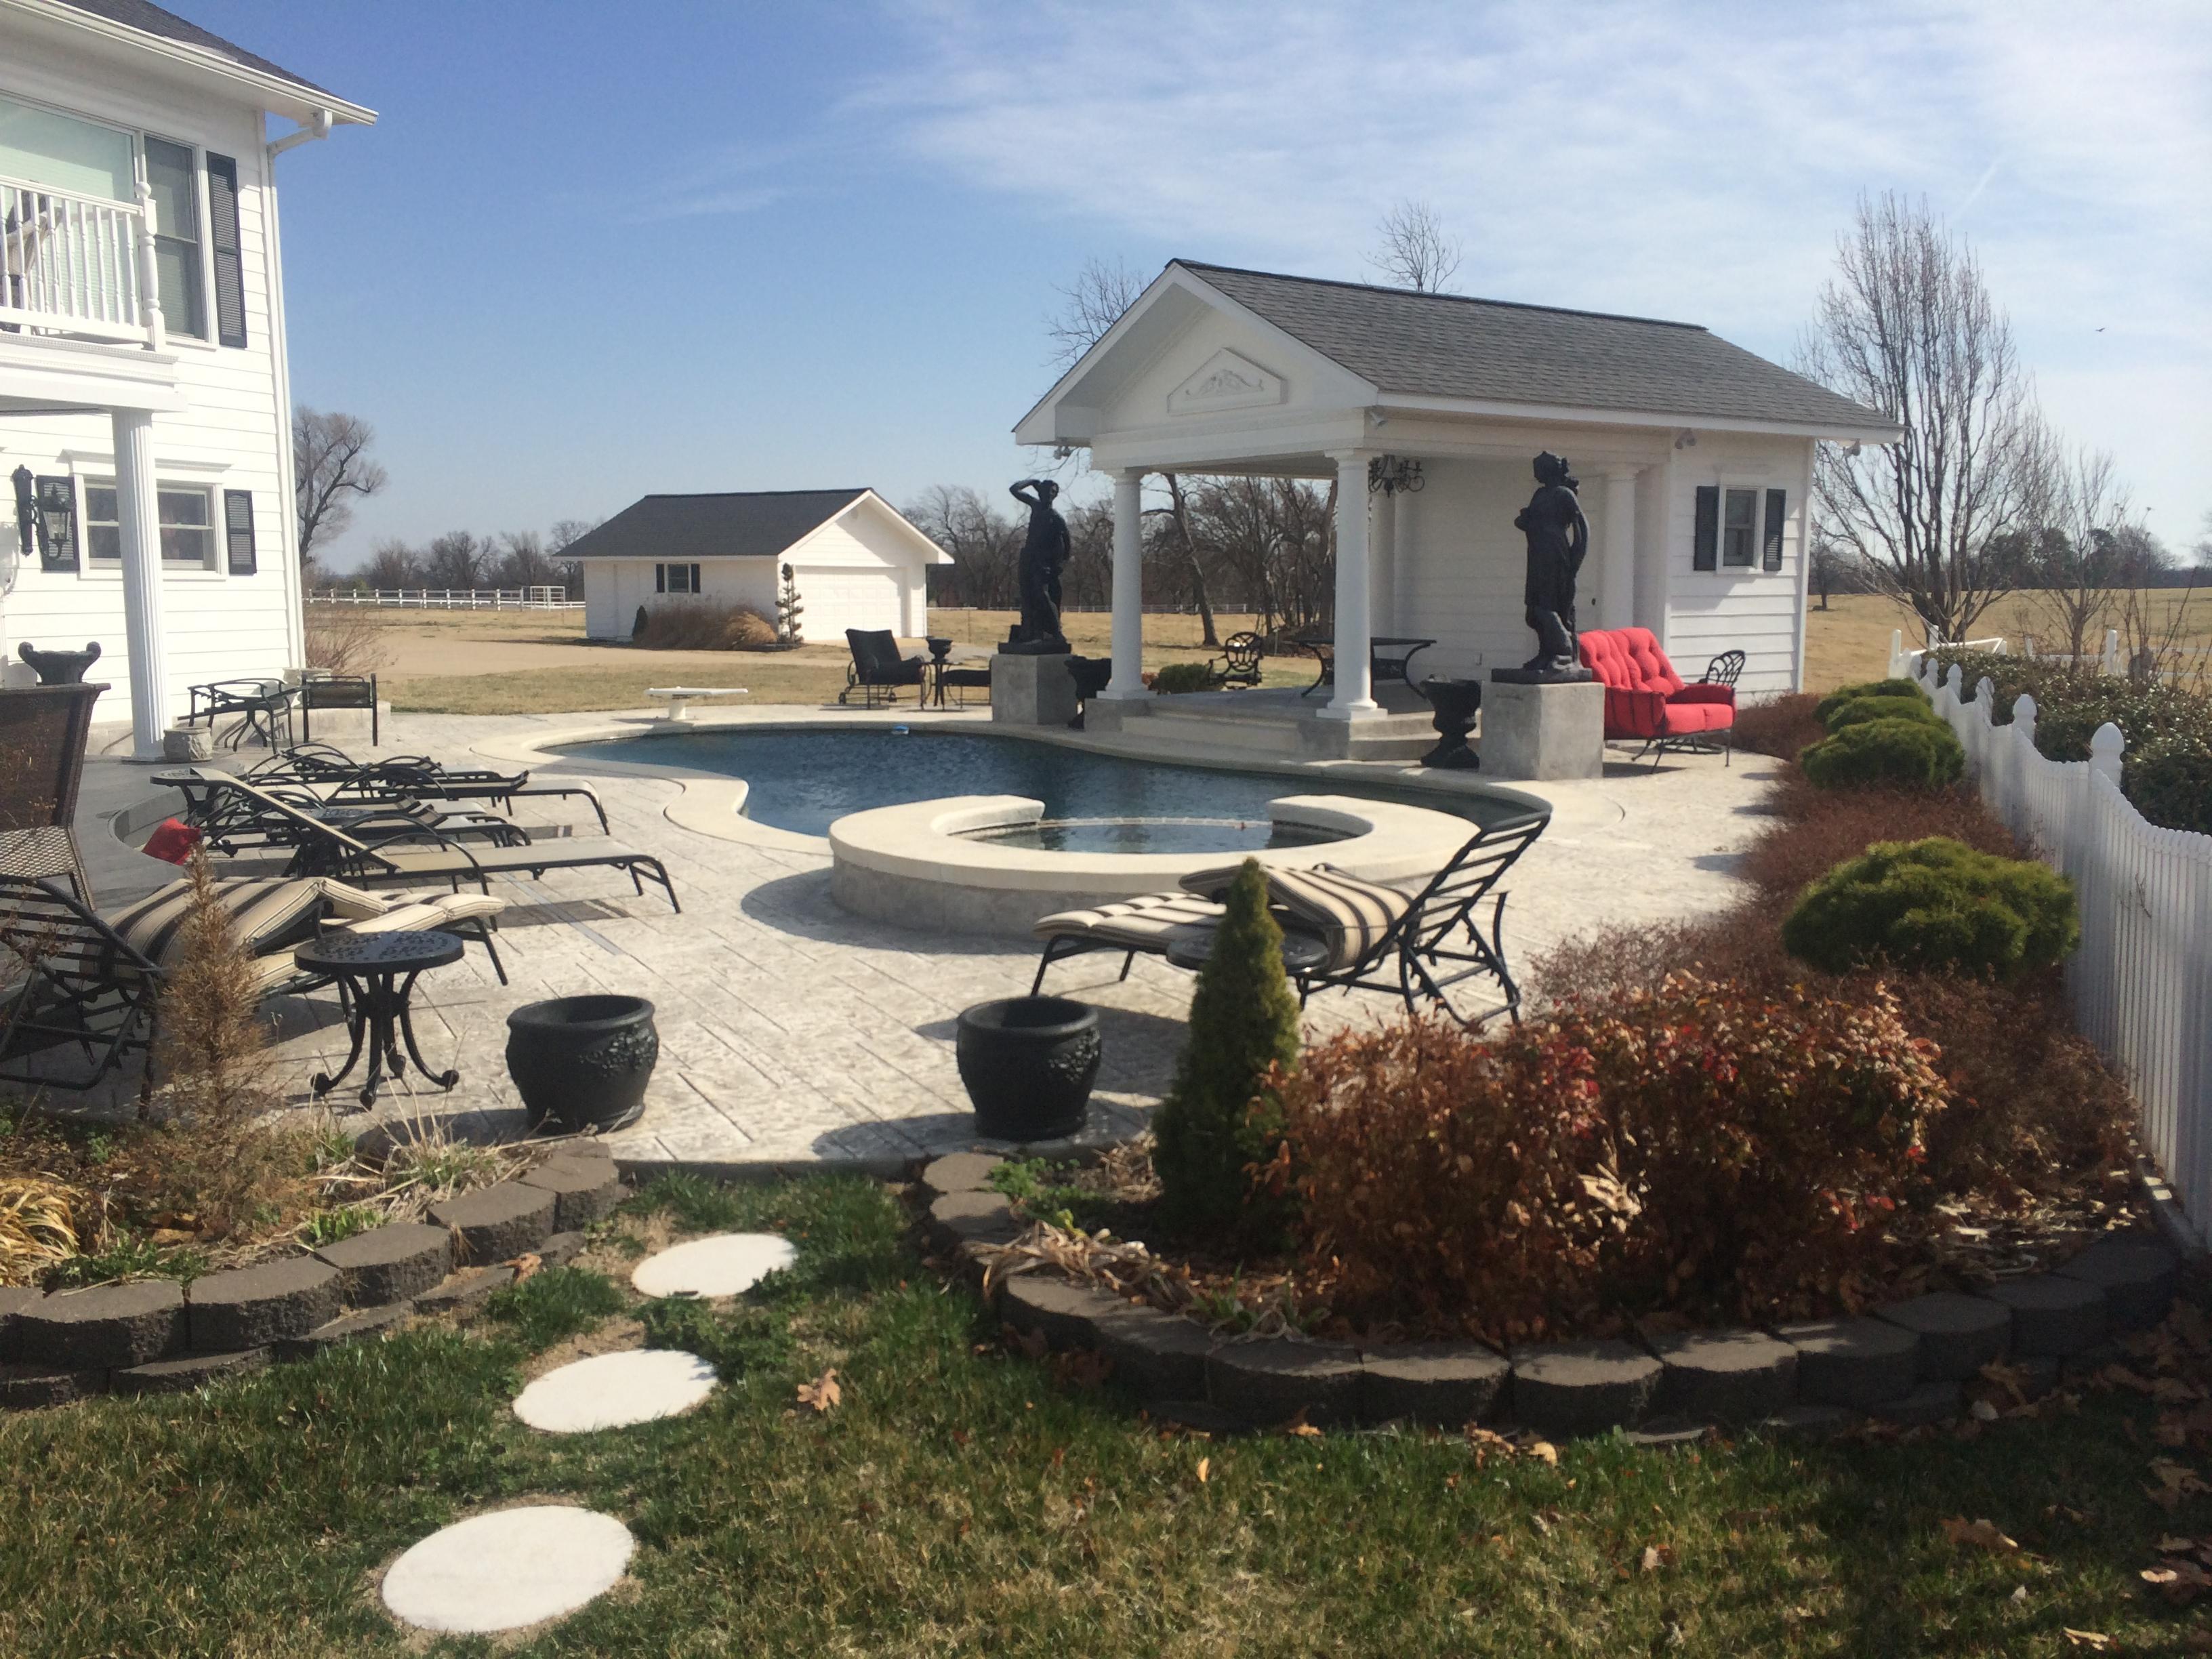 Landscaping Stones Joplin Mo : R d lawn care landscaping joplin mo